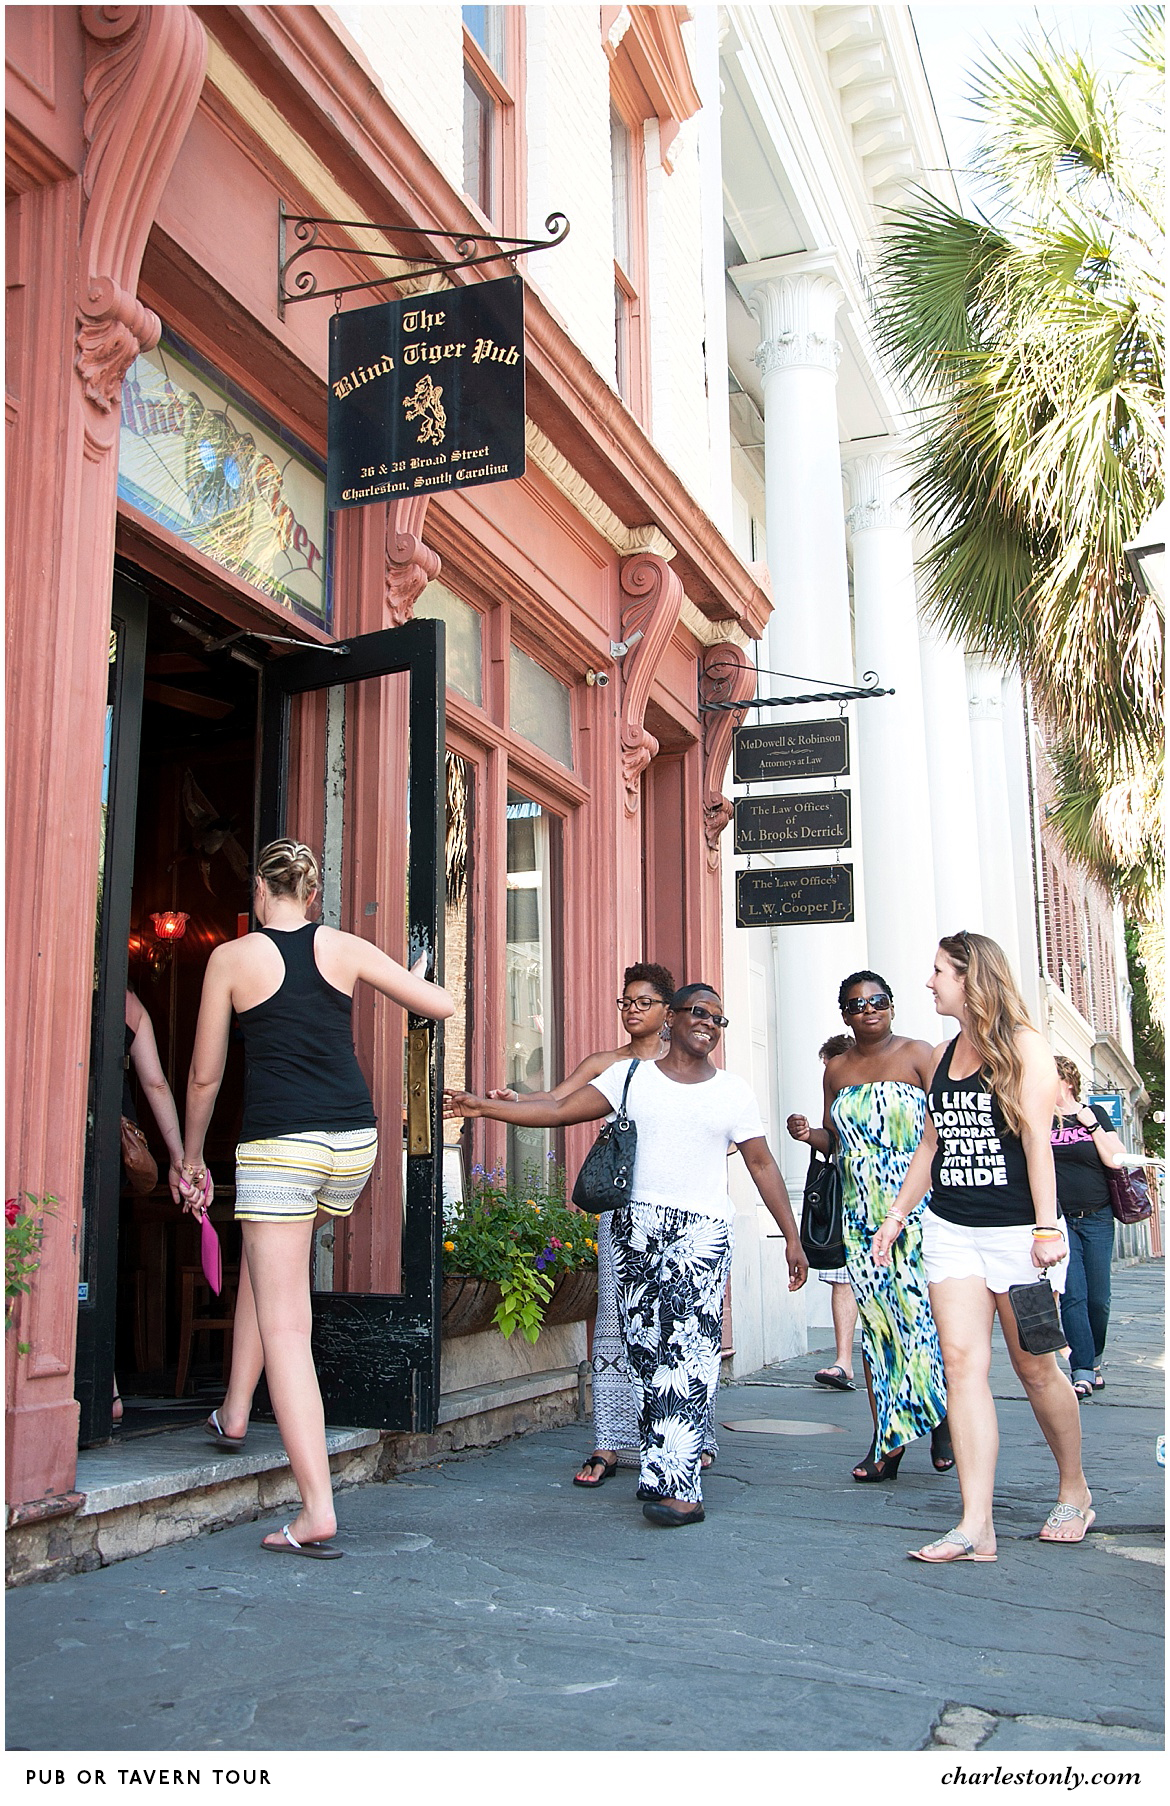 Pub or Tavern Tour